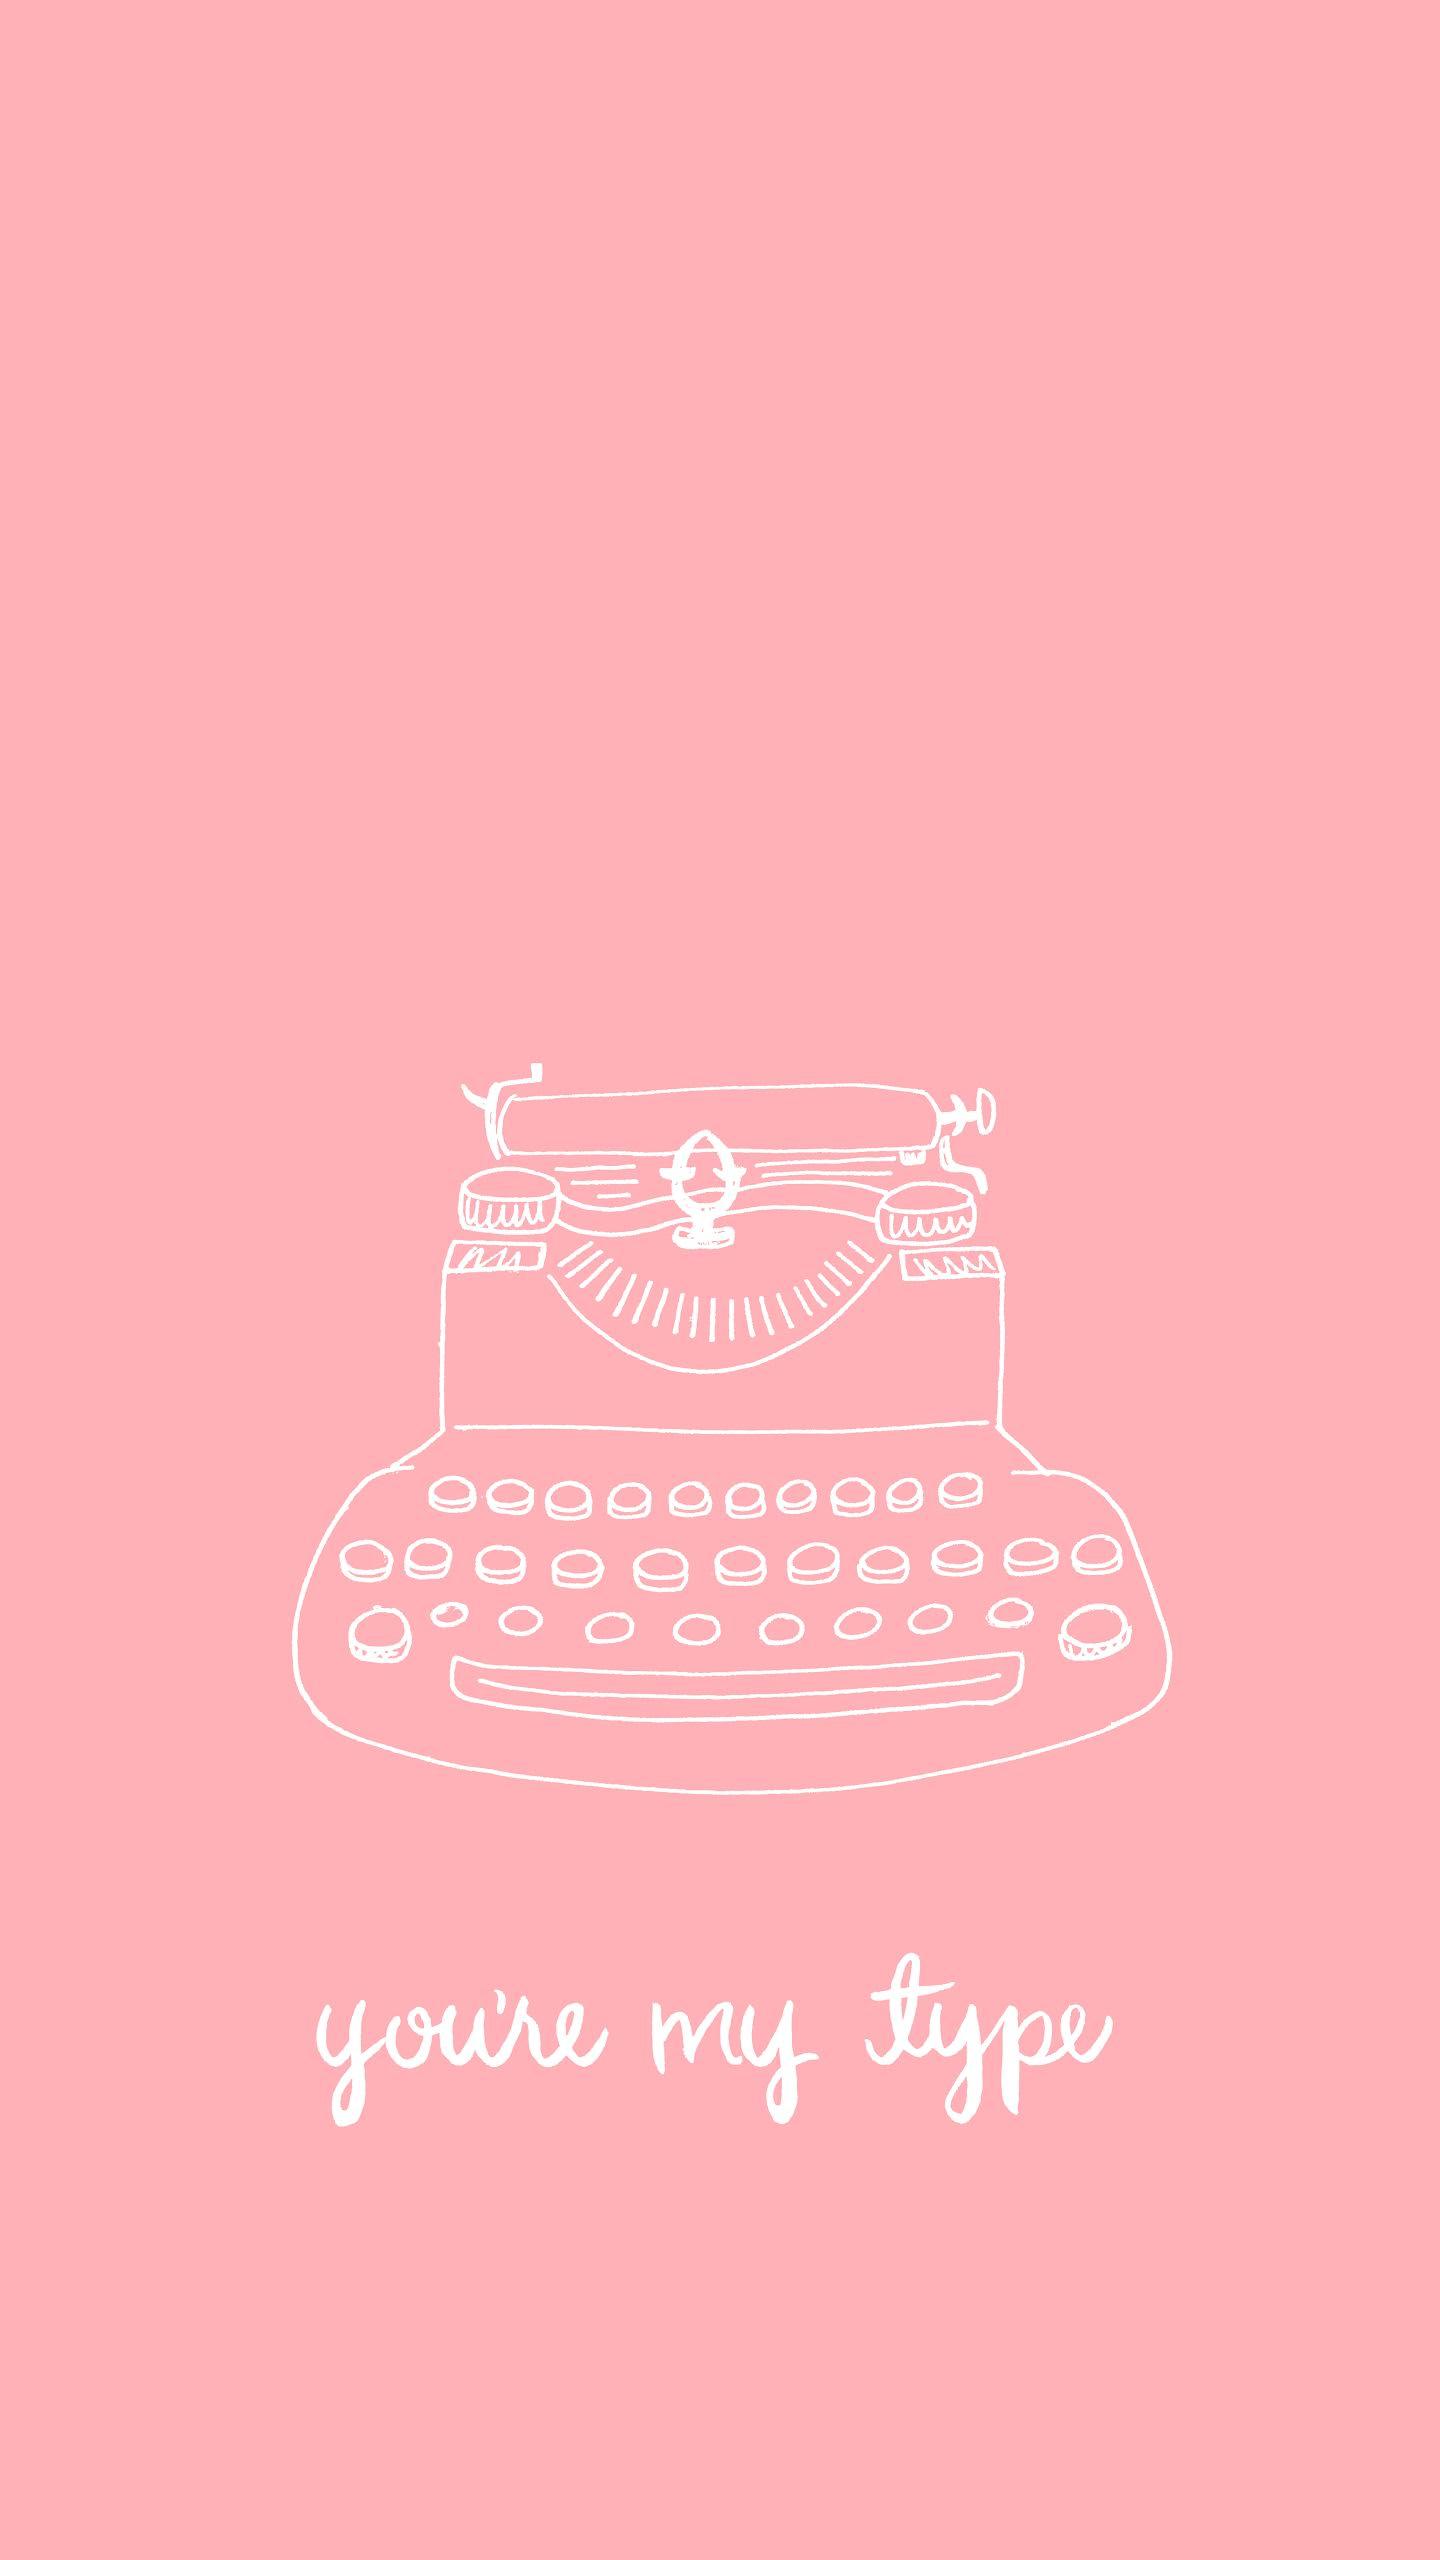 Design-Sponge-Valentine-s-Day-wallpaper-wp5805072-1